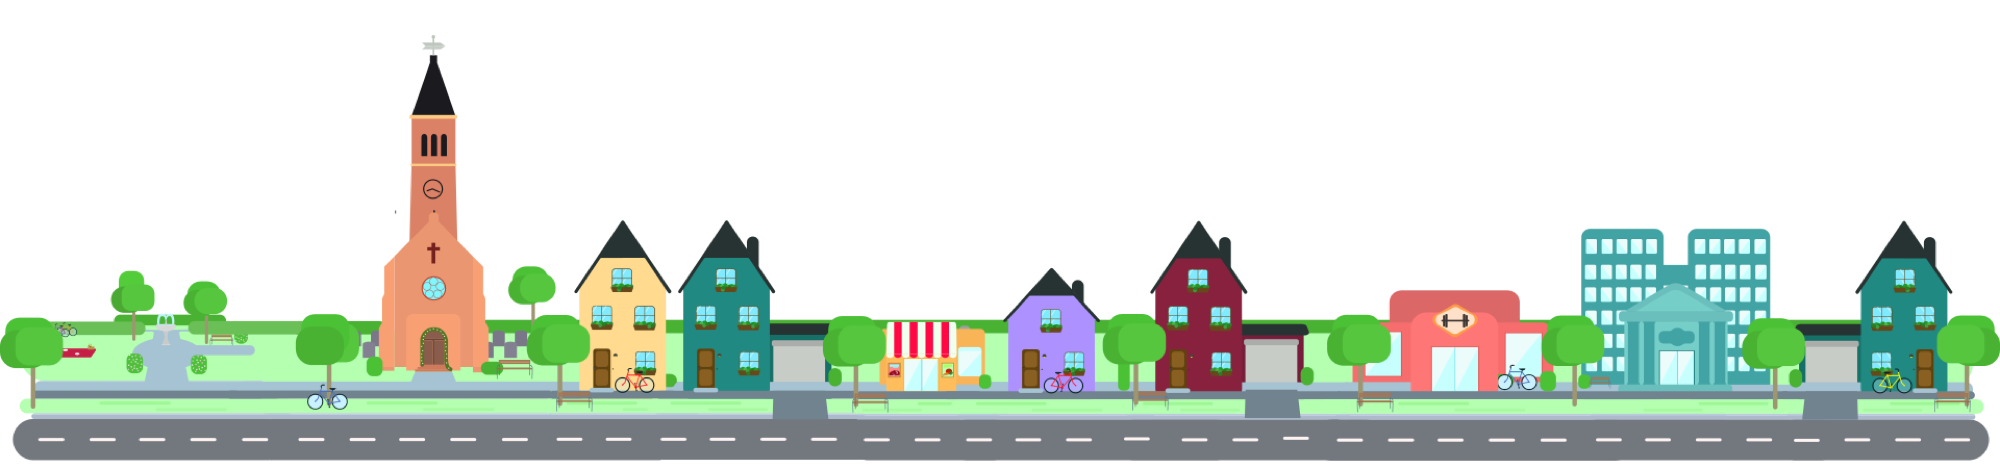 Neighborhood clipart residential community. Hommr claim your address